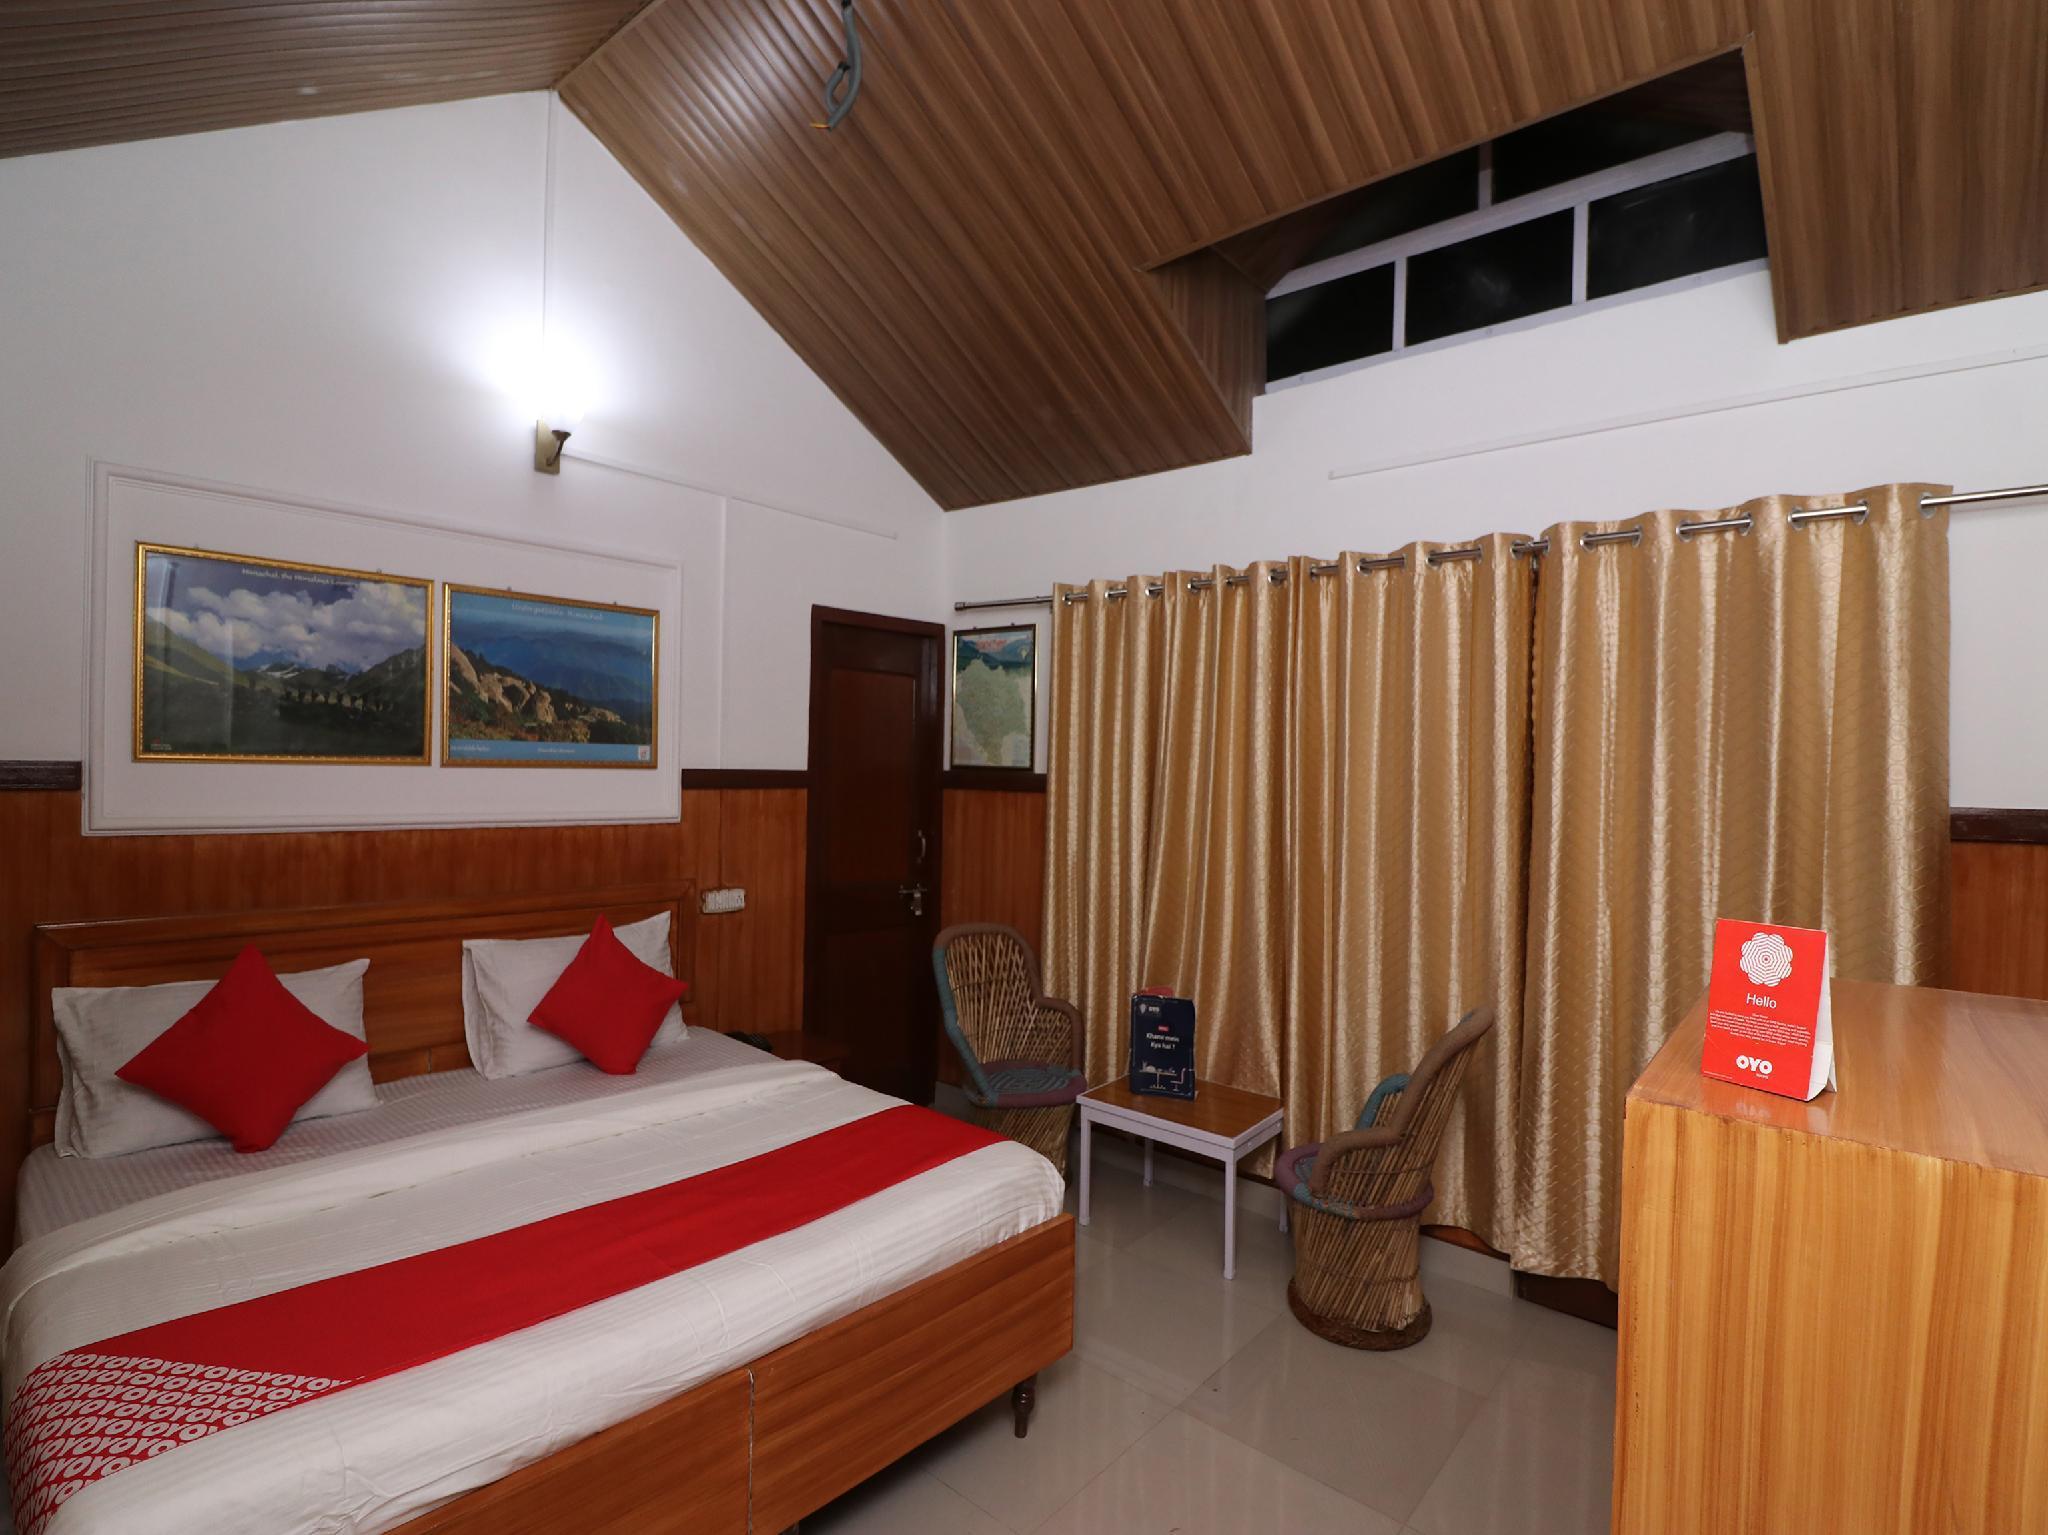 OYO 24530 Laxmi Residency